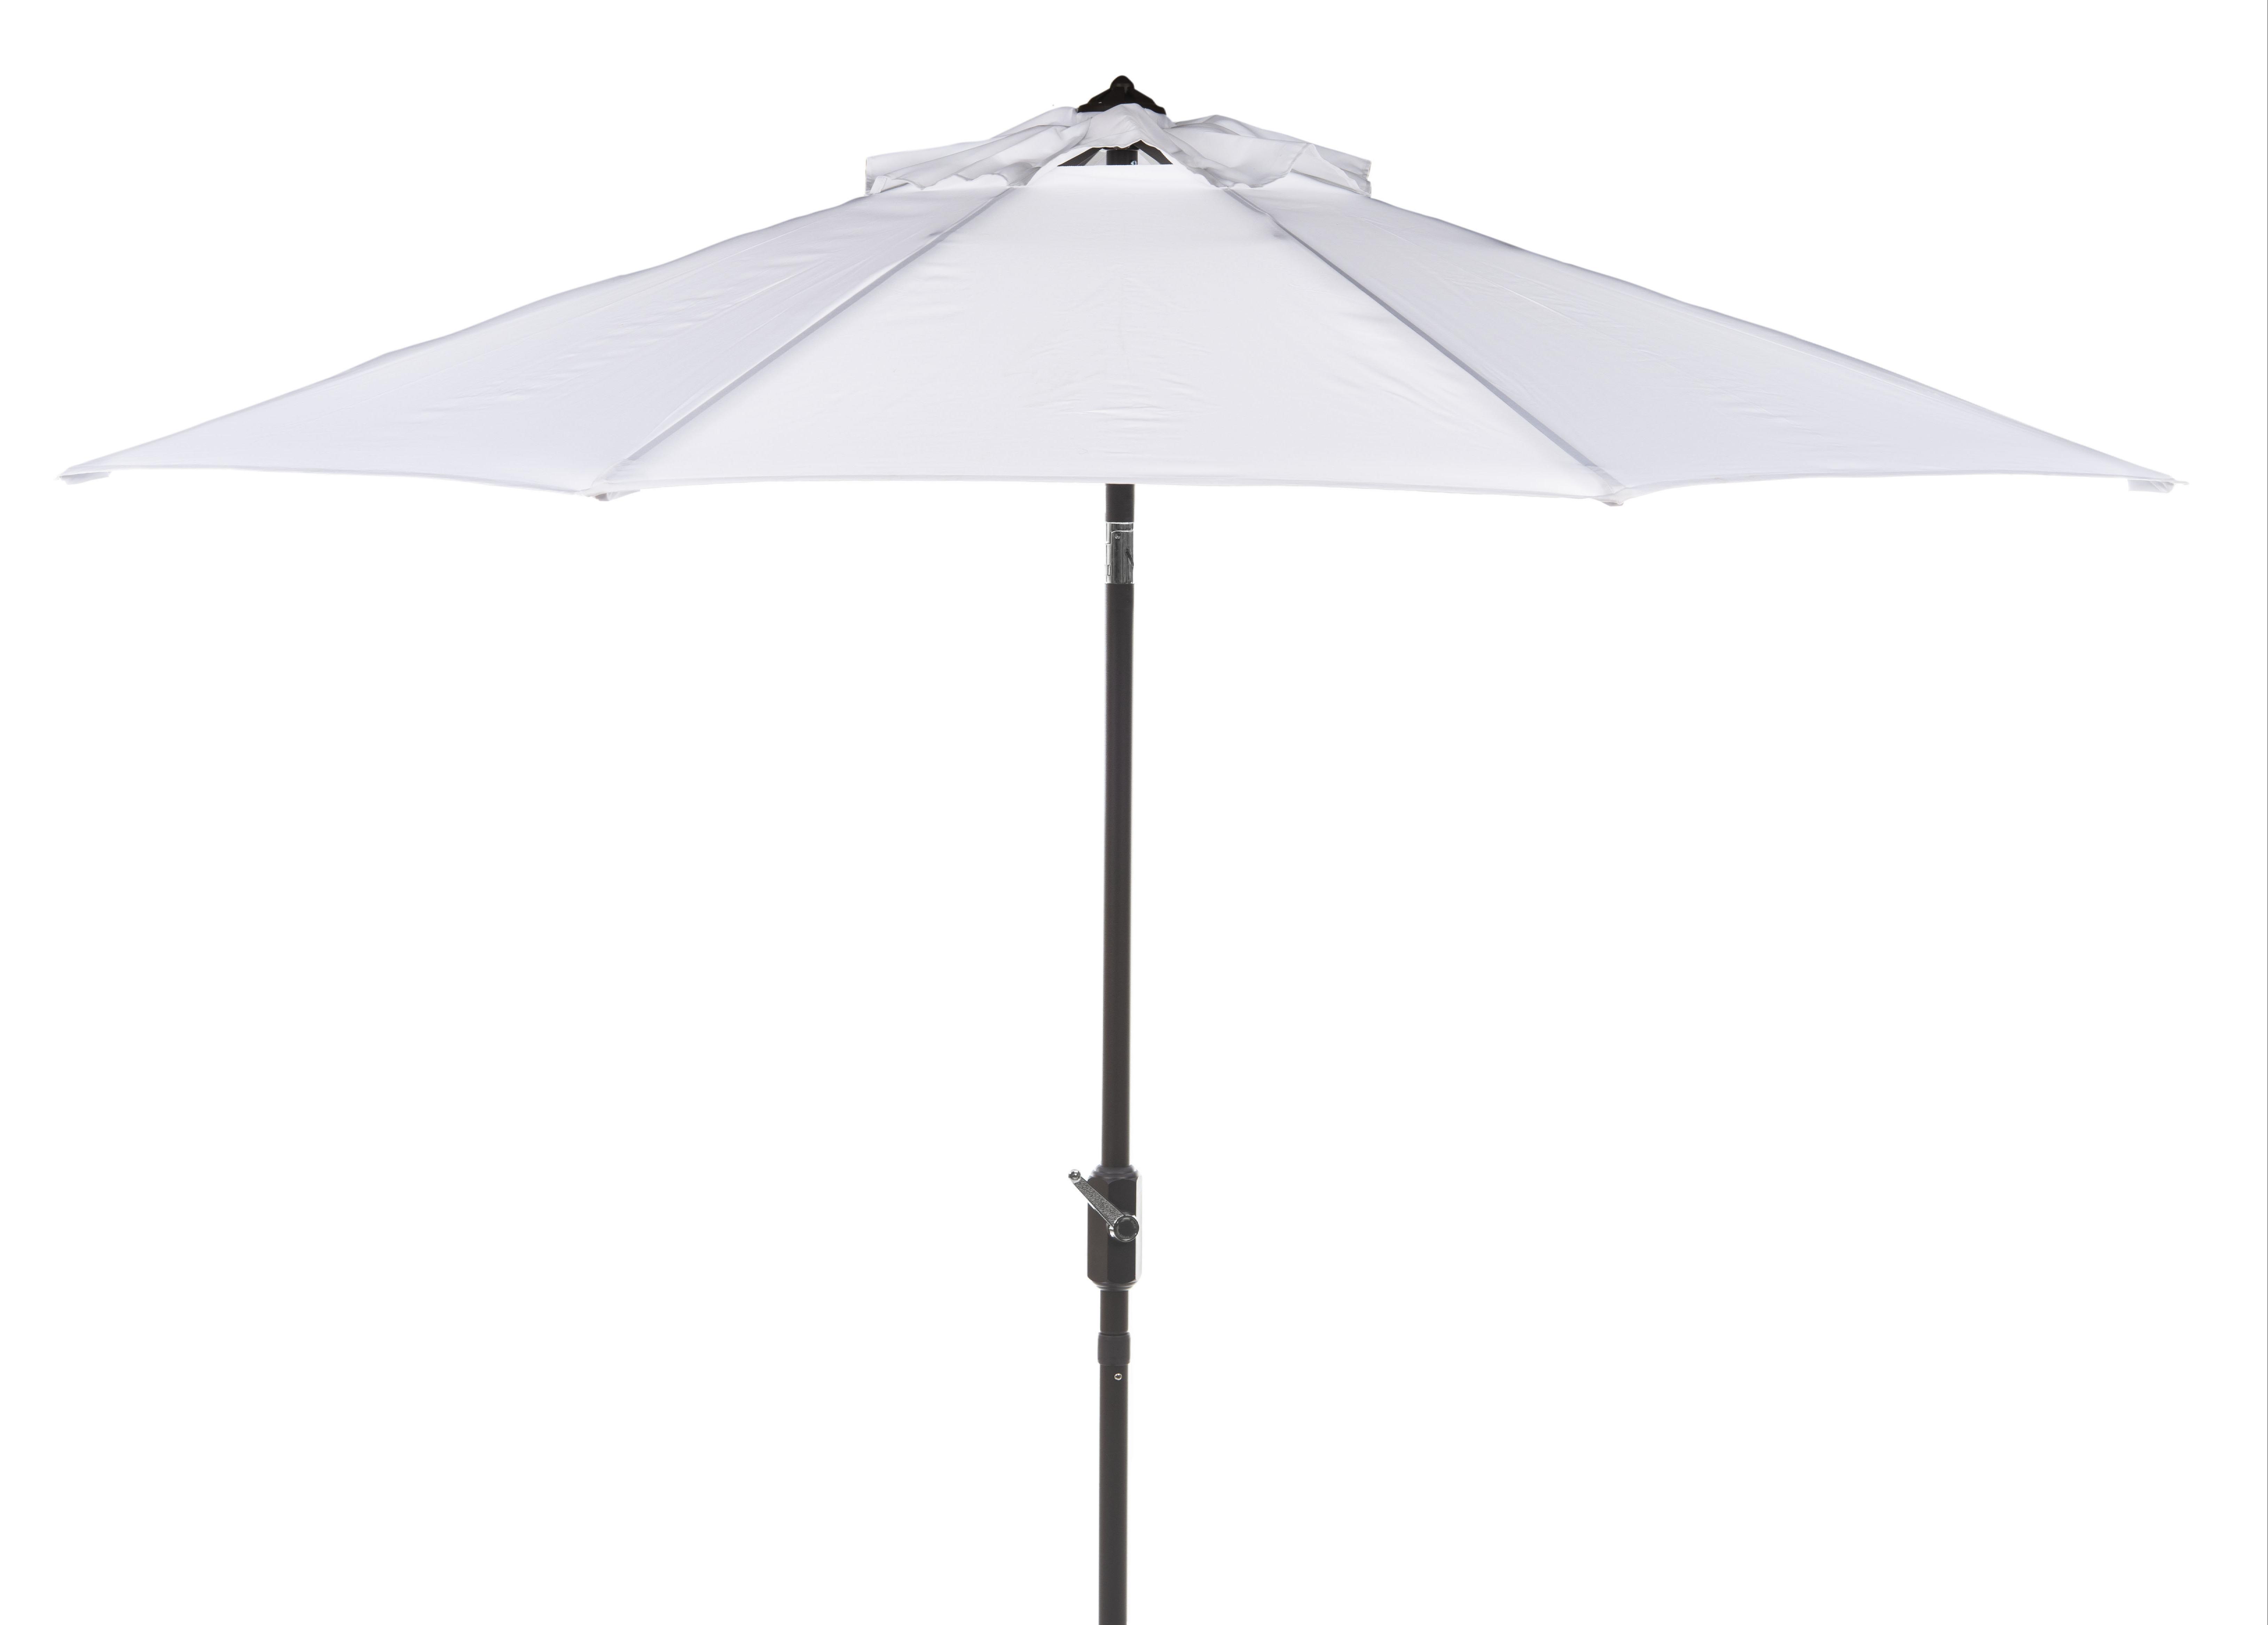 Belles 9 Market Umbrella Regarding Most Up To Date Caravelle Market Umbrellas (Gallery 8 of 20)